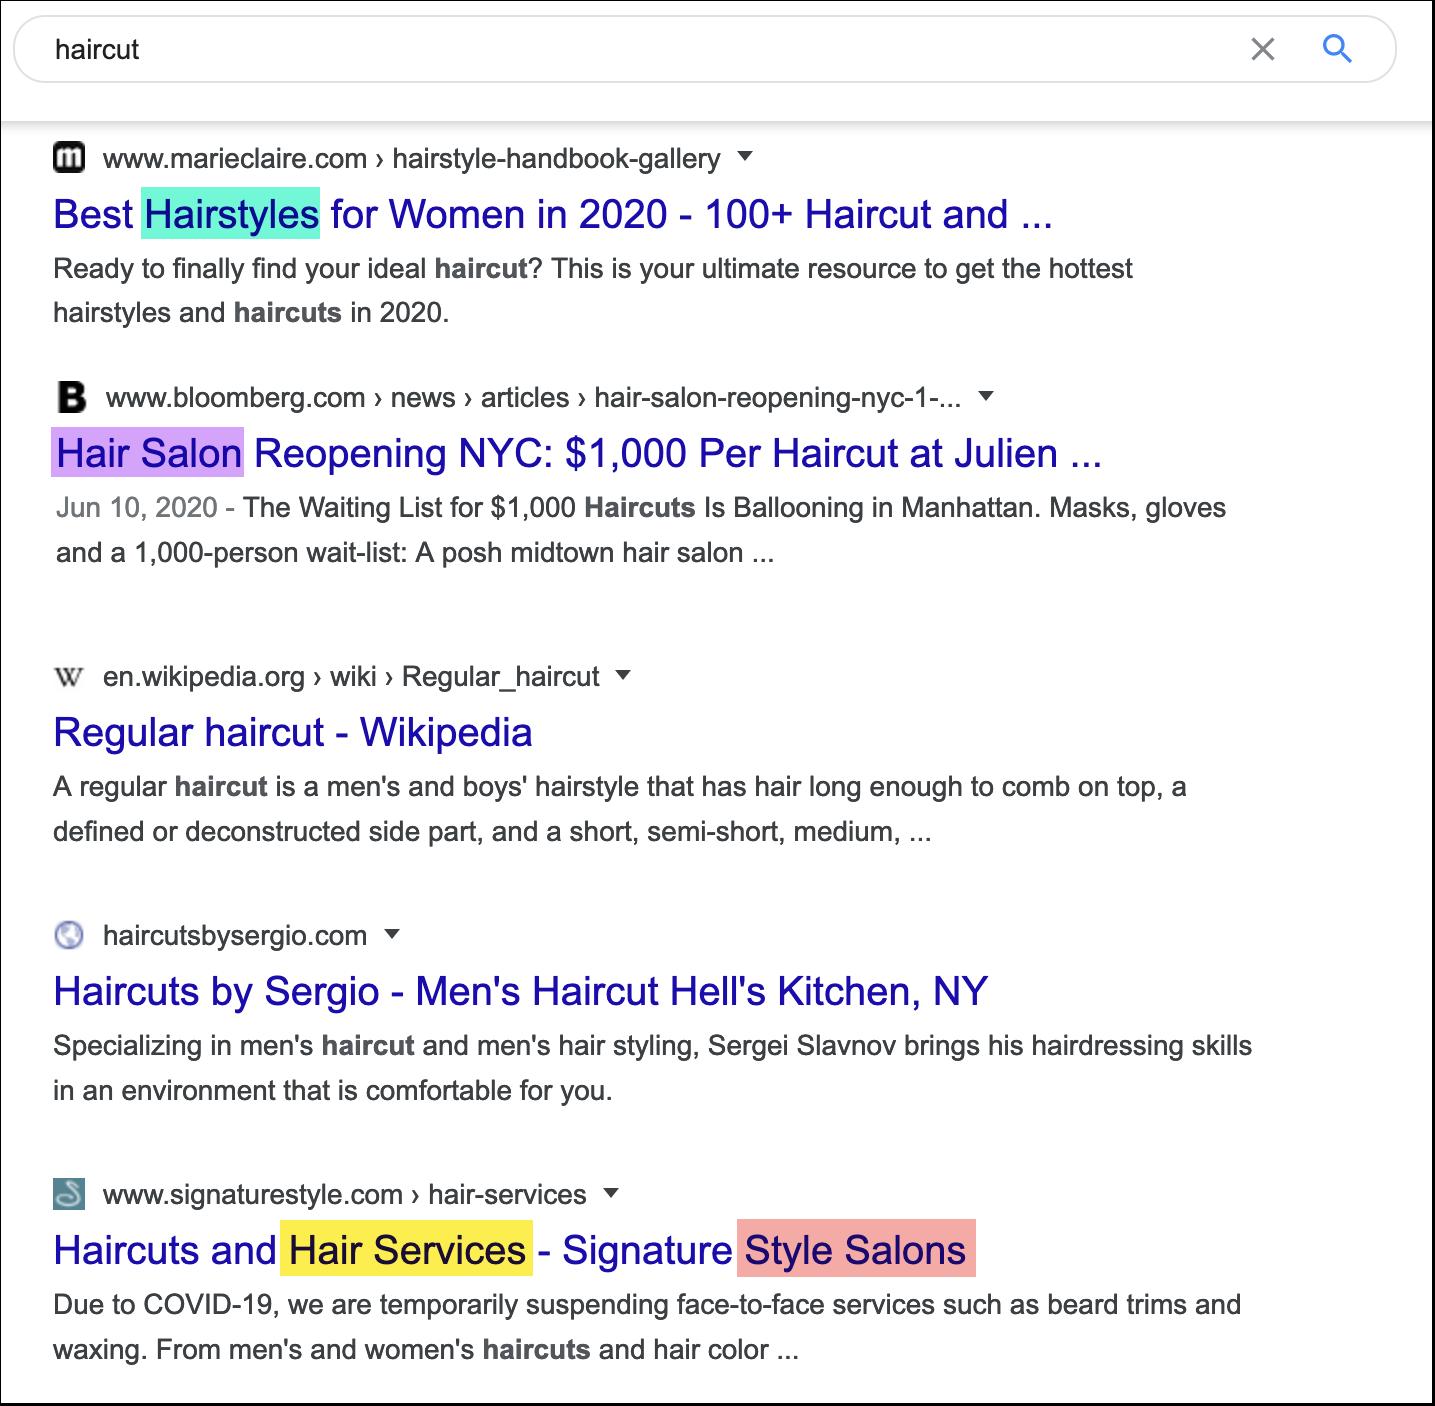 Keyword research in Google